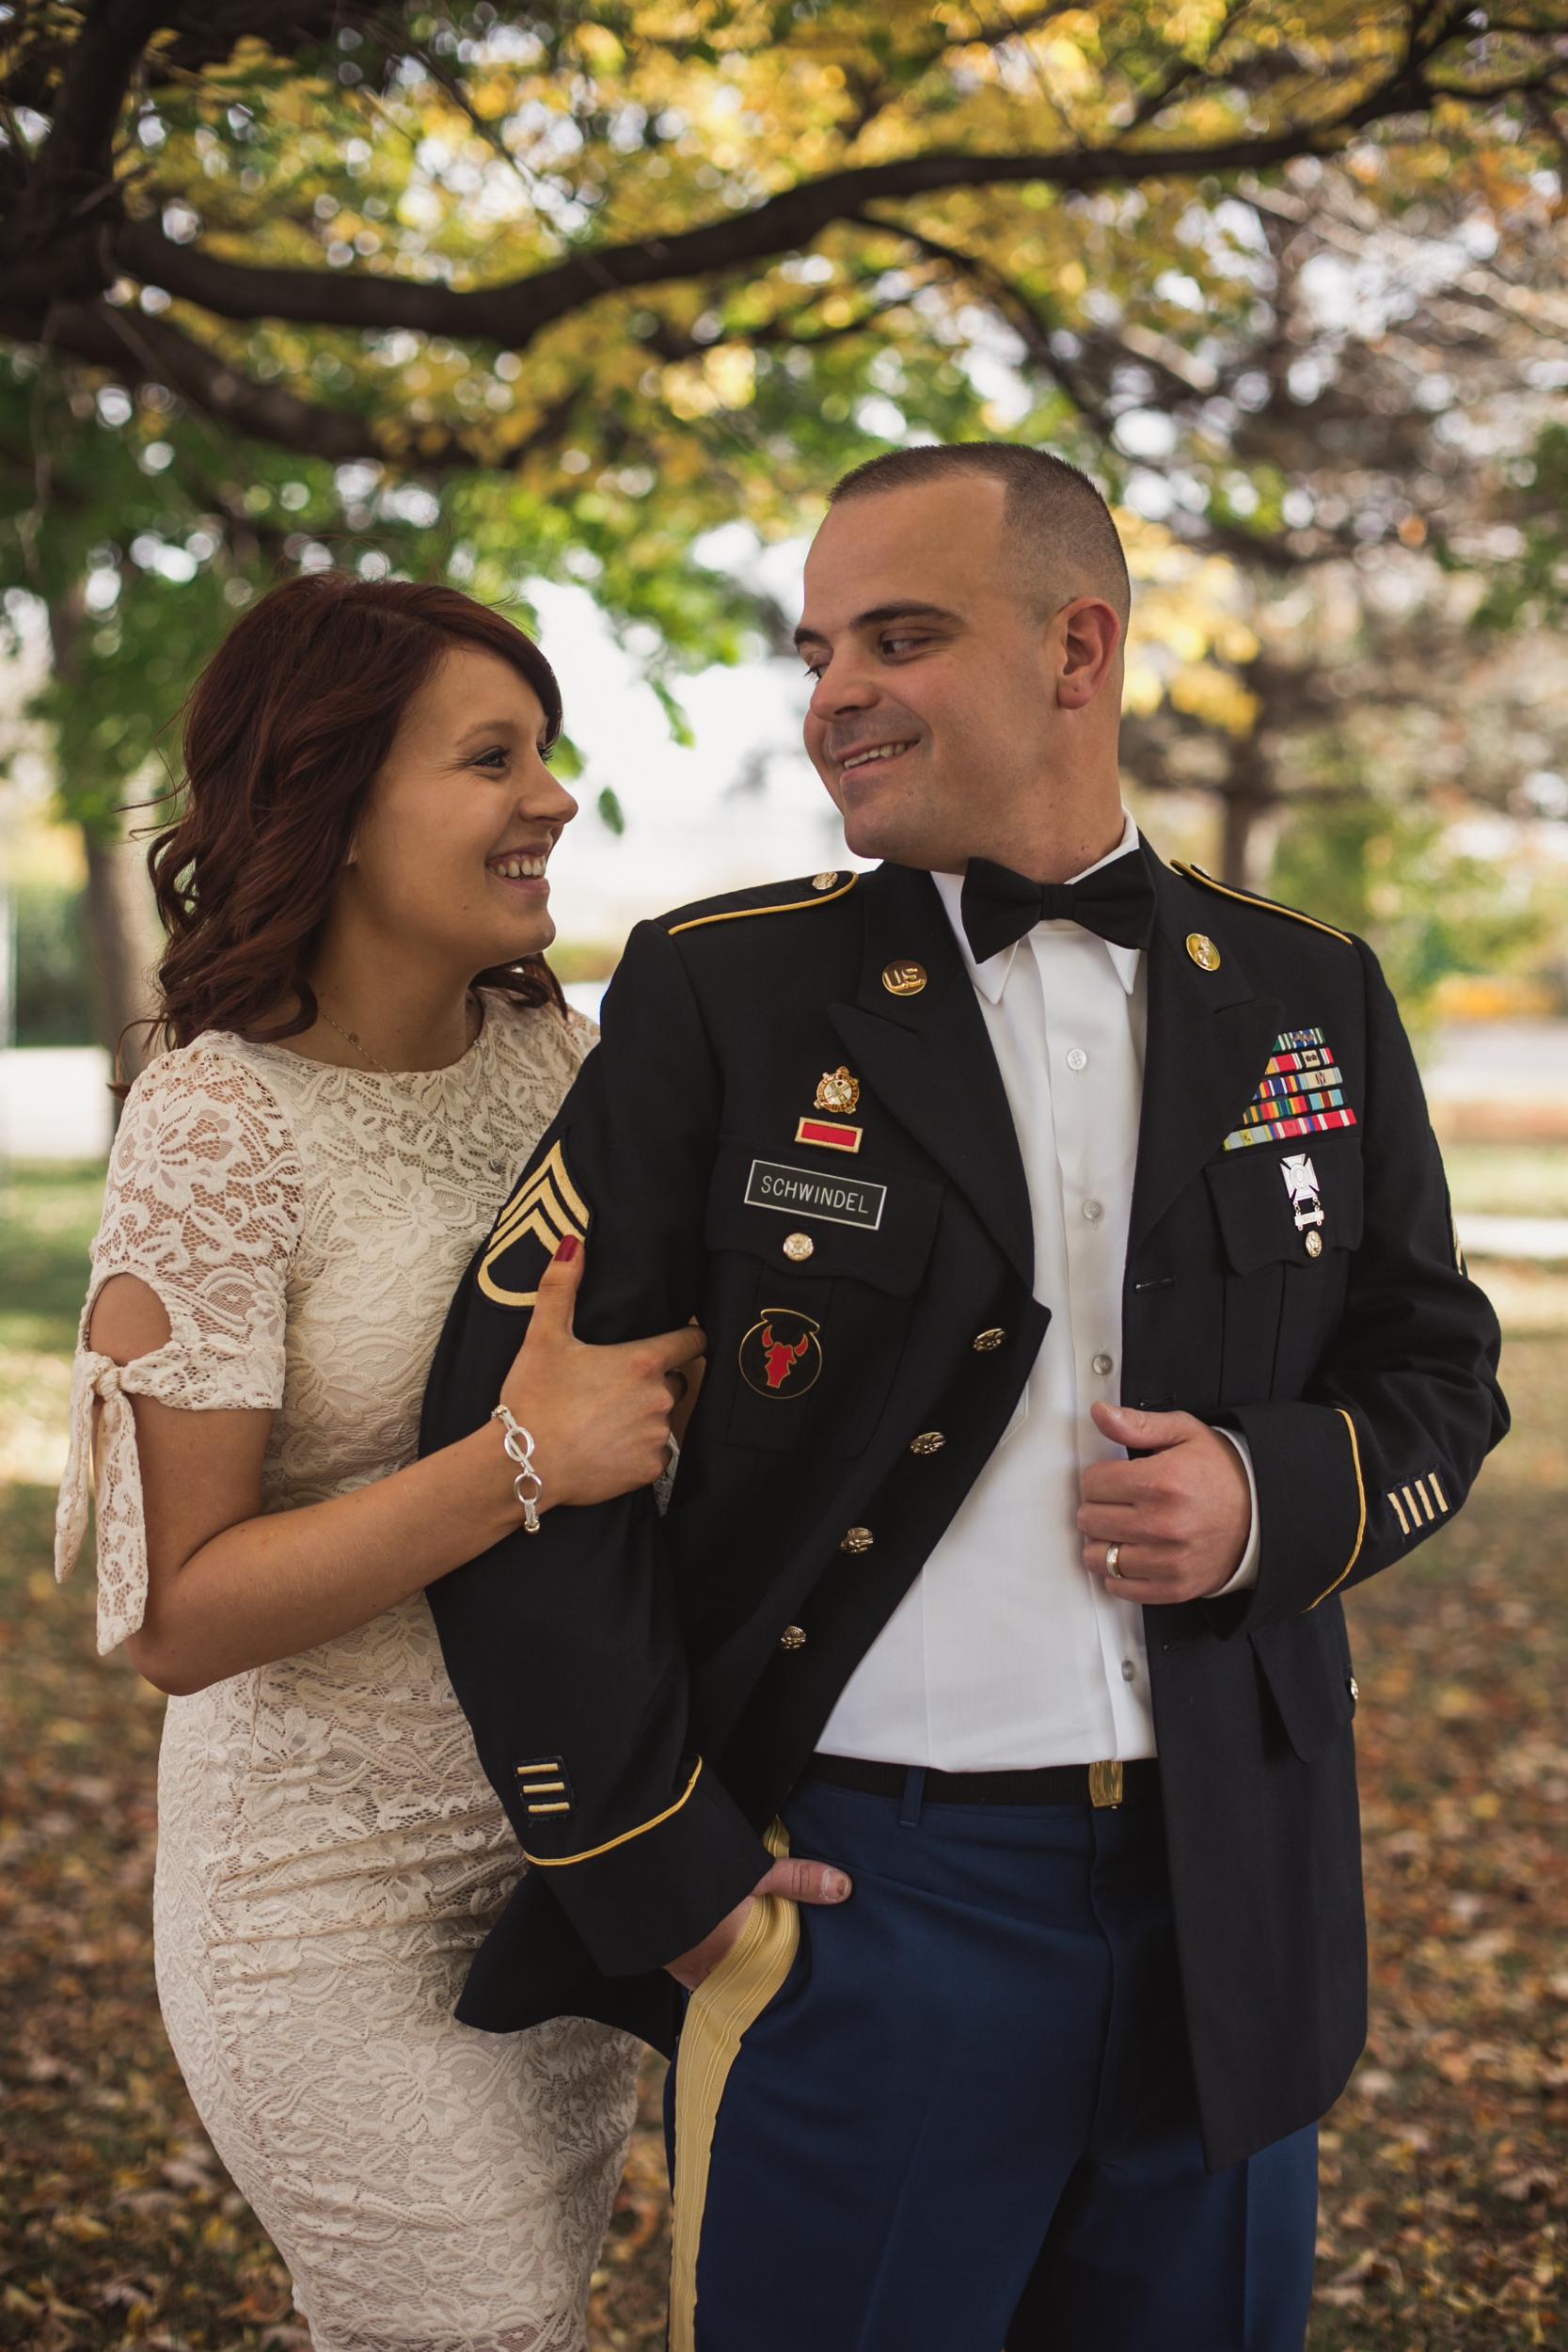 Fort Snelling Elopement St. Paul, MN, Fort Snelling Elopement, Military Elopement, Intimate Military Wedding, intimate elopement wedding-www.rachelsmak.com9.jpg